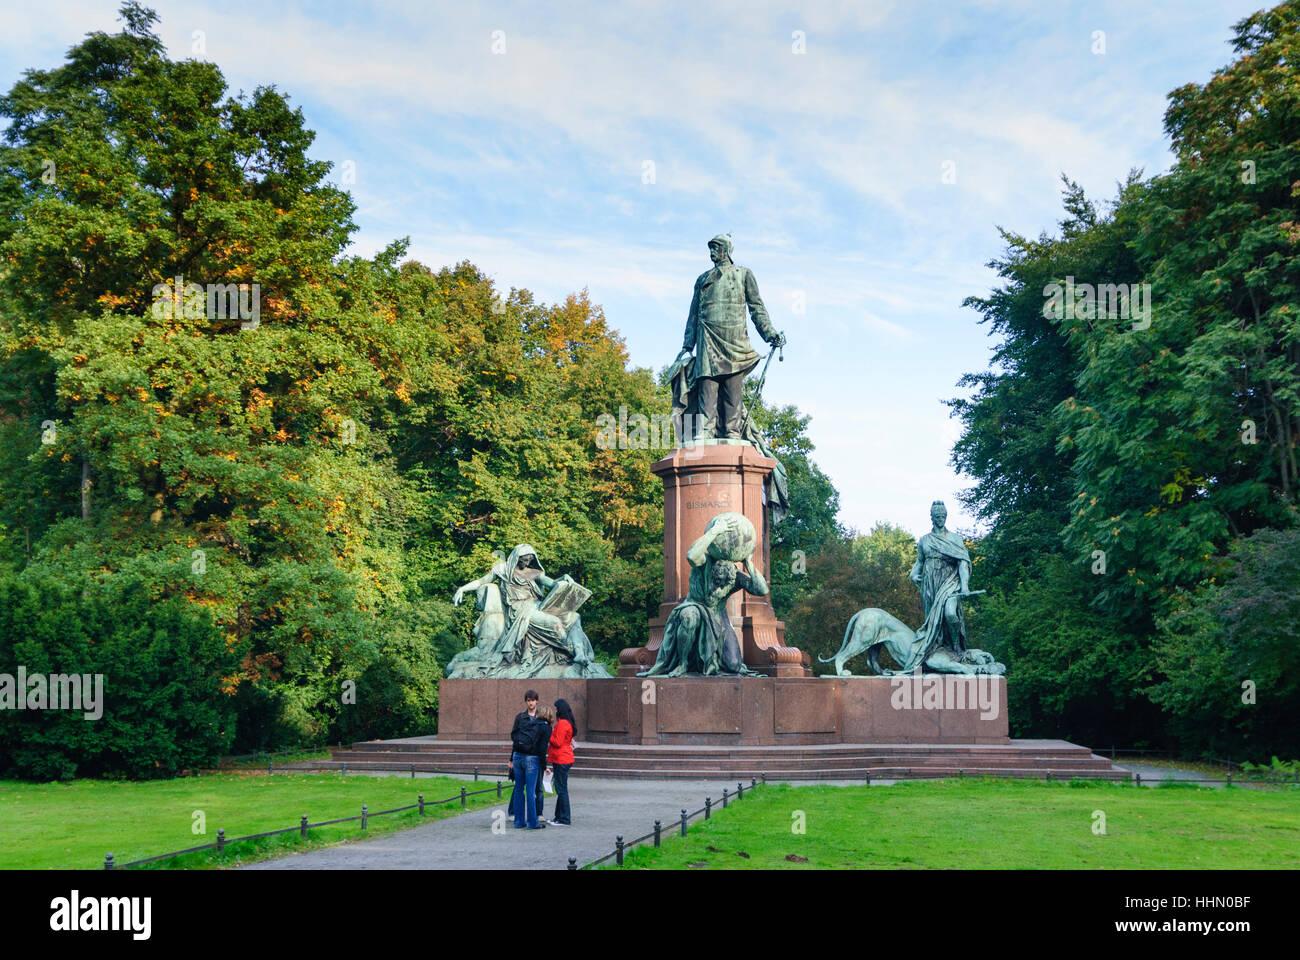 Berlin: Bismarck monument at the Großer Stern in Tiergarten, , Berlin, Germany - Stock Image